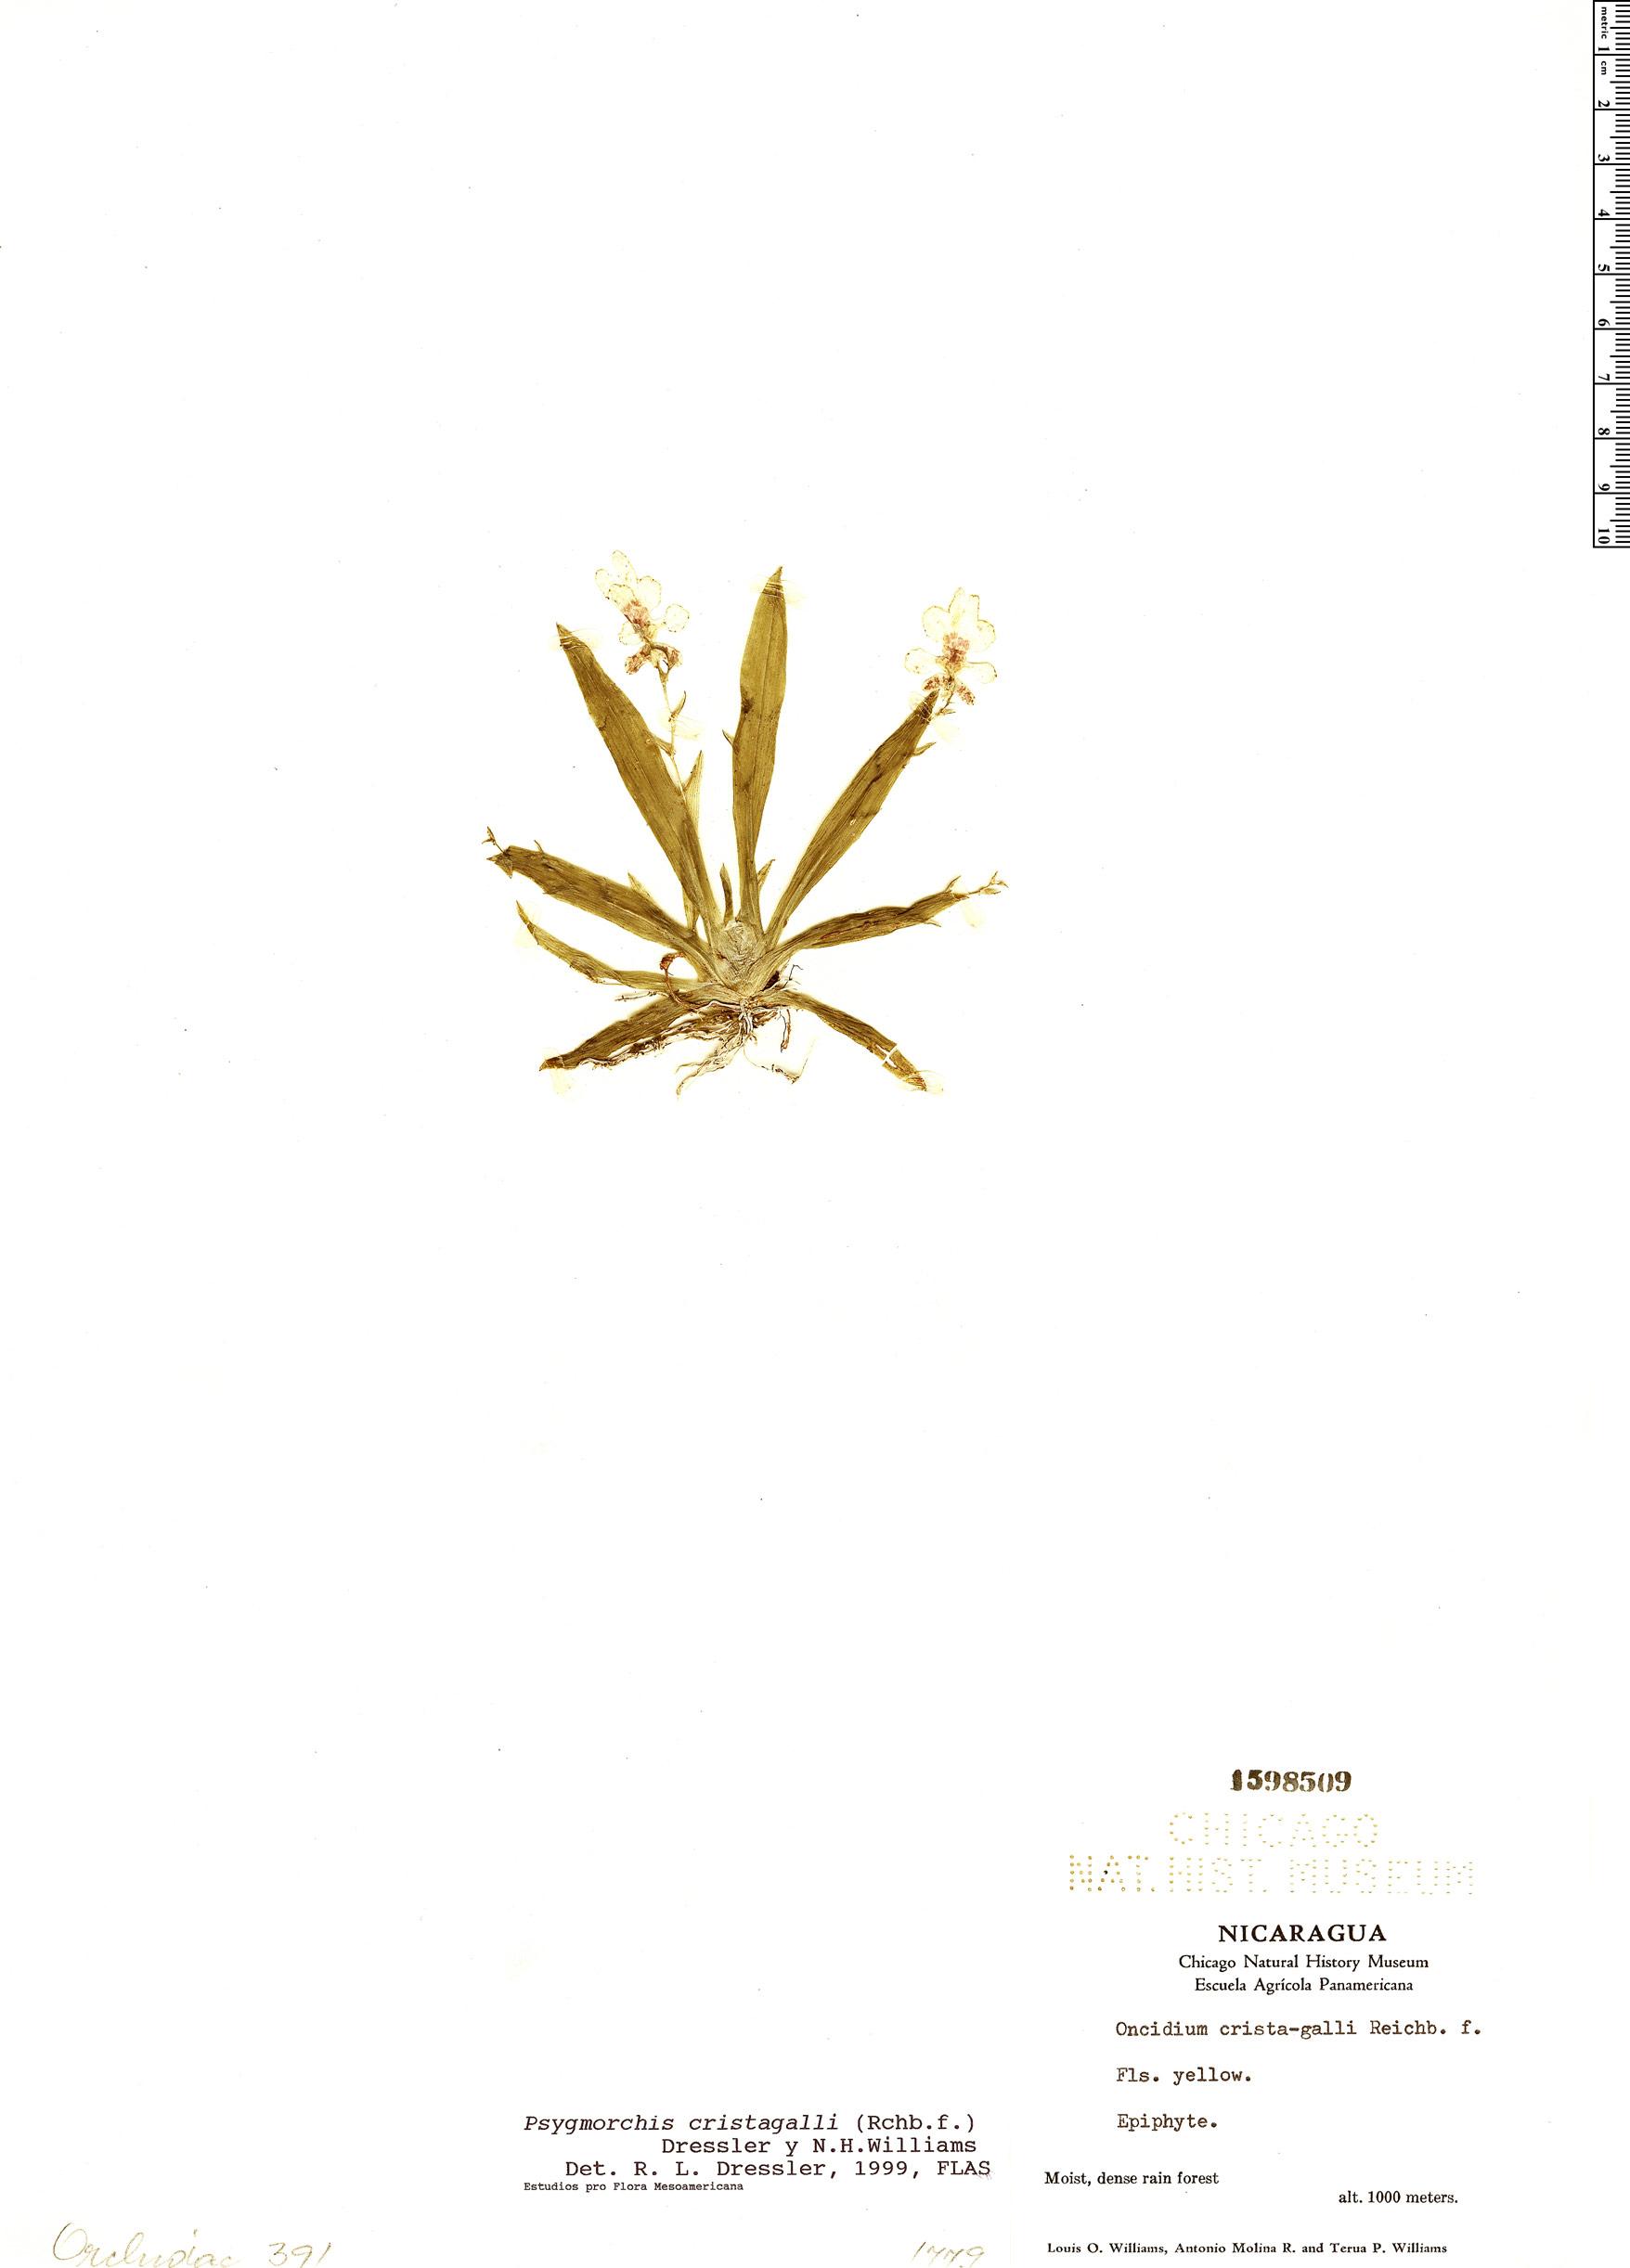 Specimen: Erycina crista-galli